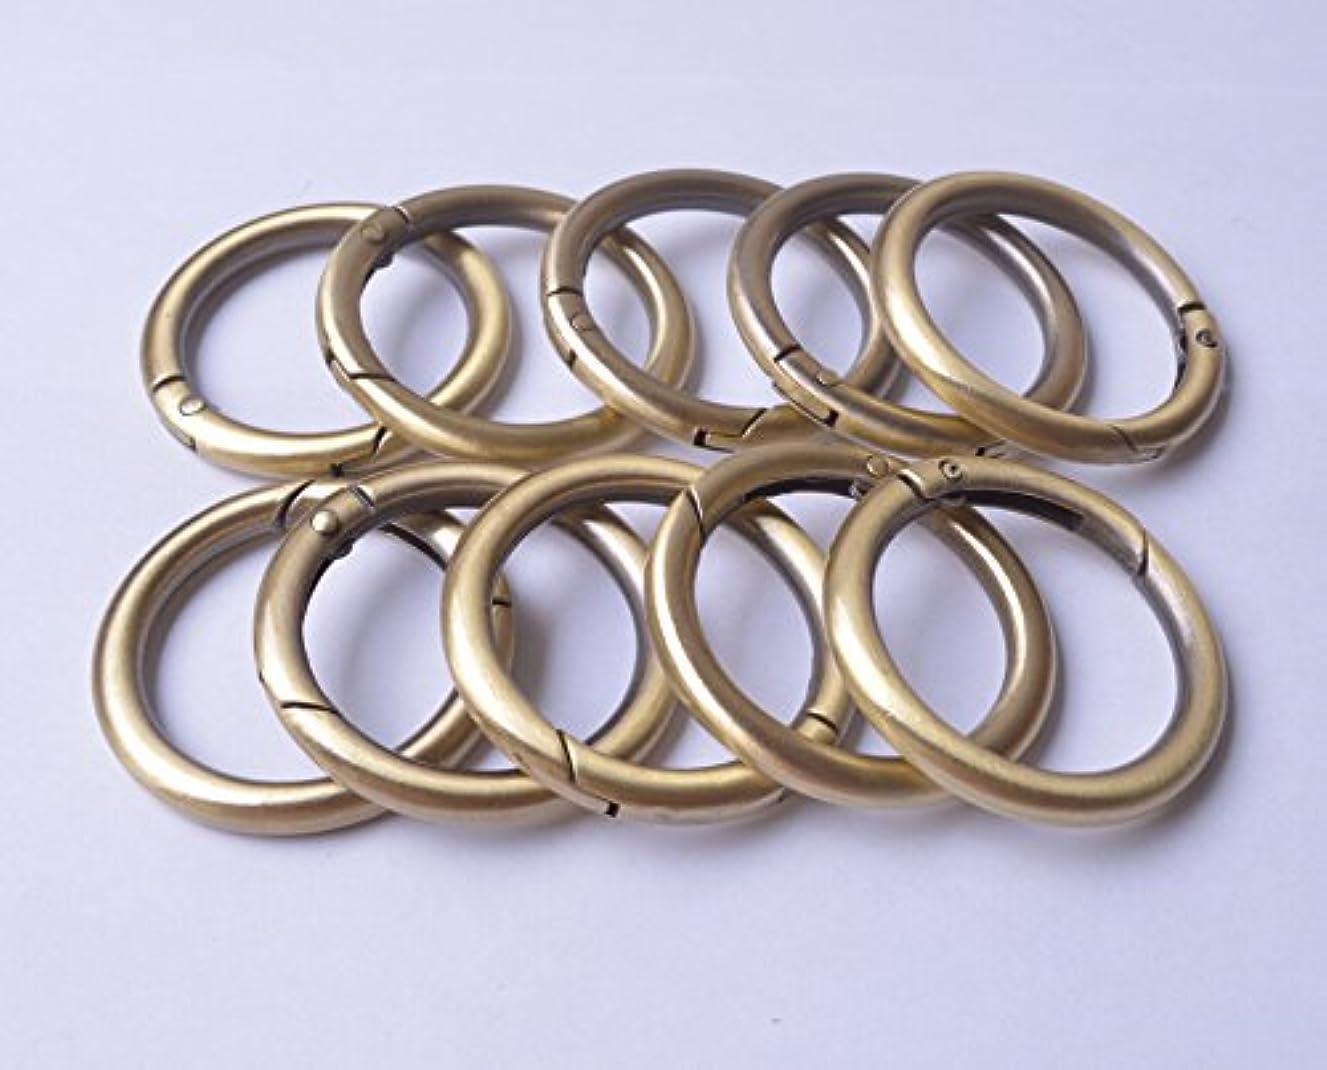 Wento 10pcs 1 1/4'' (32mm) Gate Brushed Brass O Ring Round Carabiner Snap Clip Trigger Spring Keyring Buckle WTOR001 (1 1/4'', Brushed Brass)